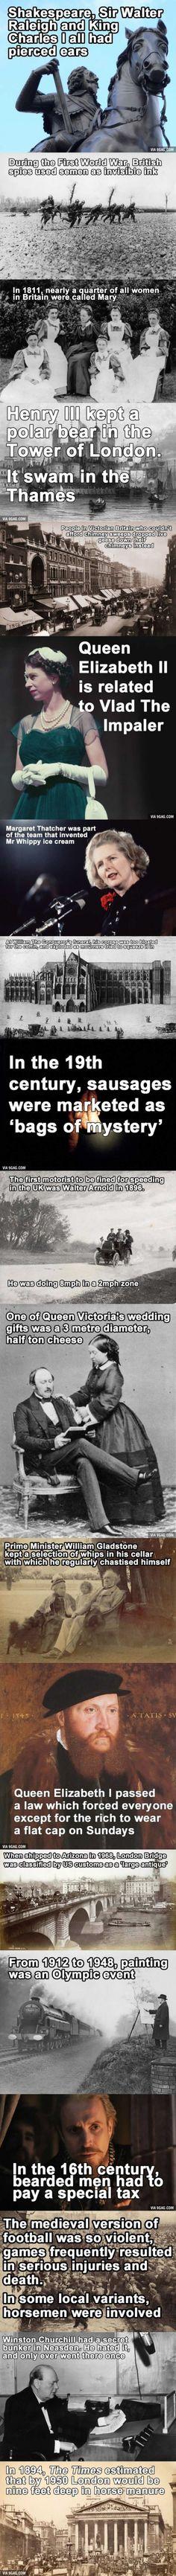 19 Facts of British History